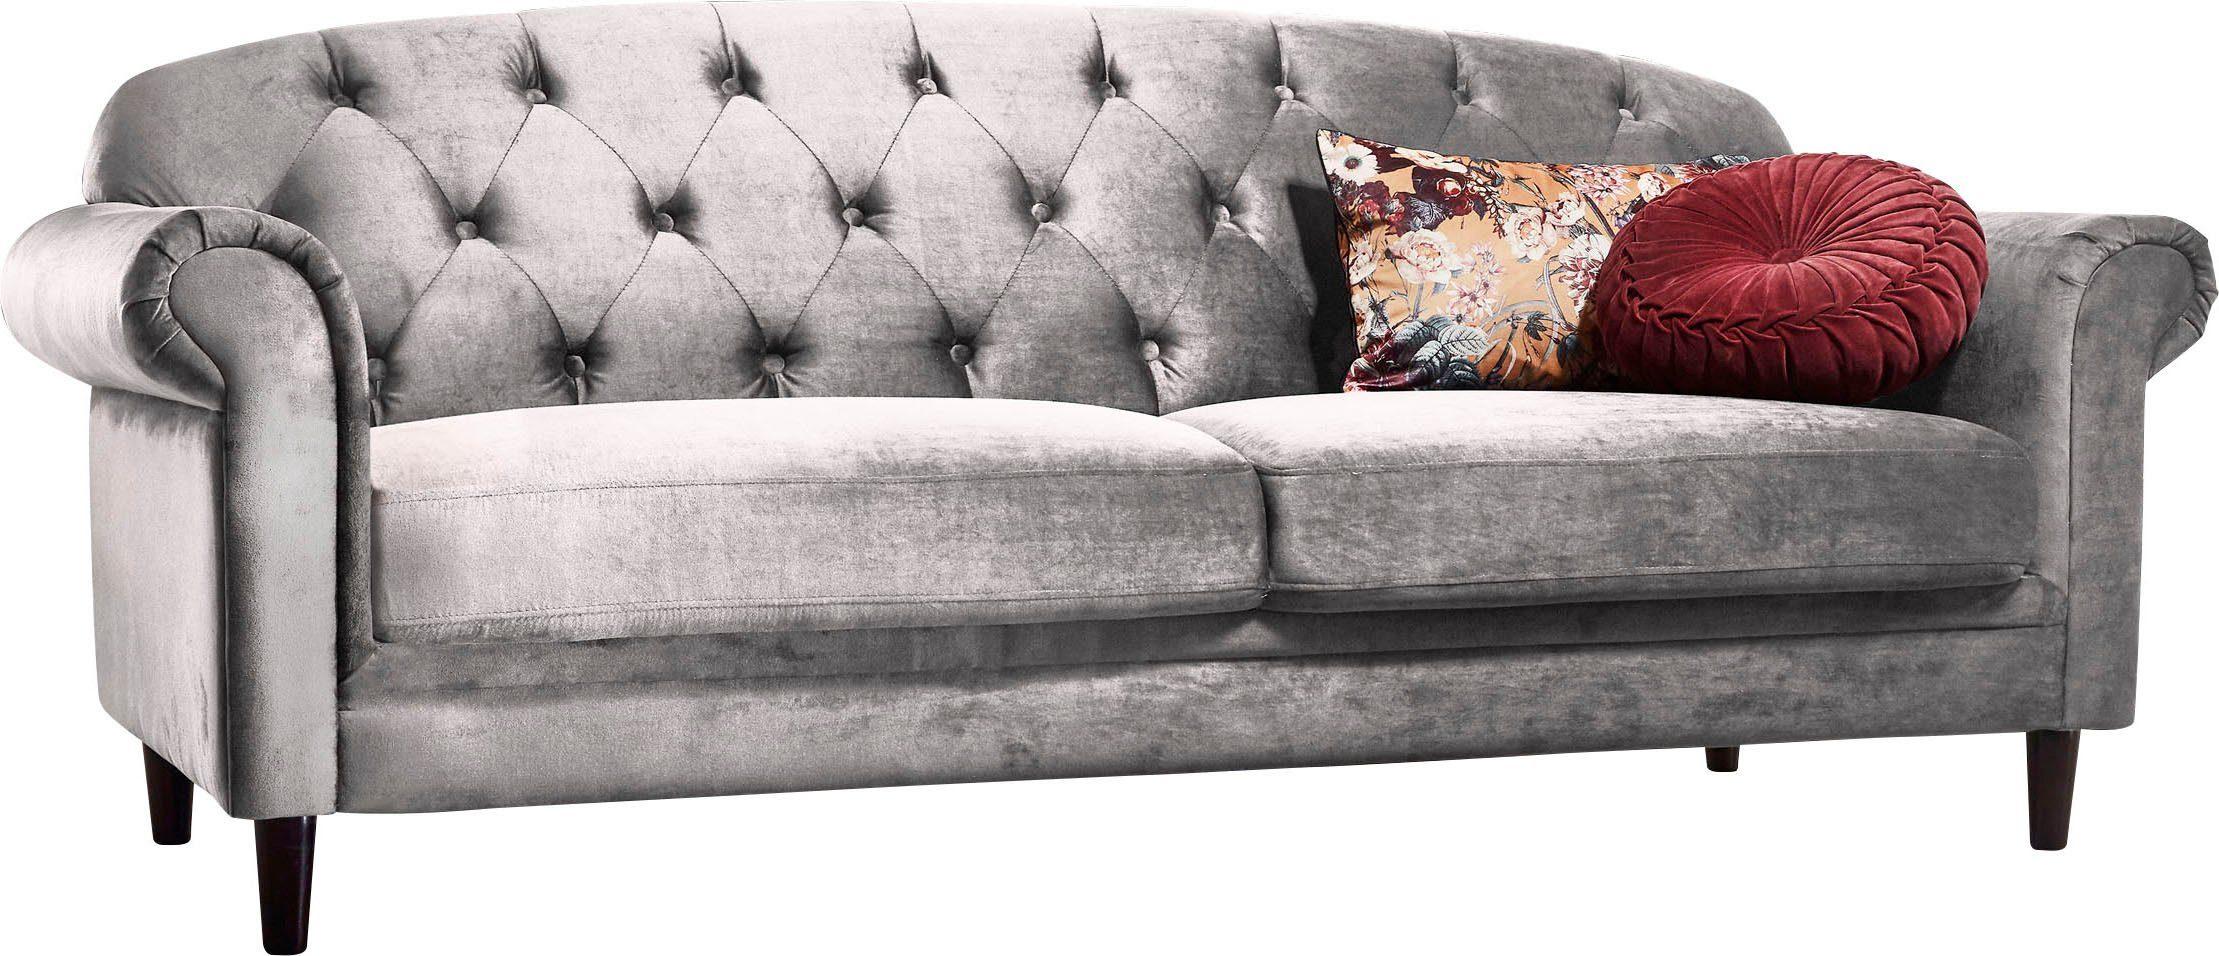 2-Sitzer Sofa Carla